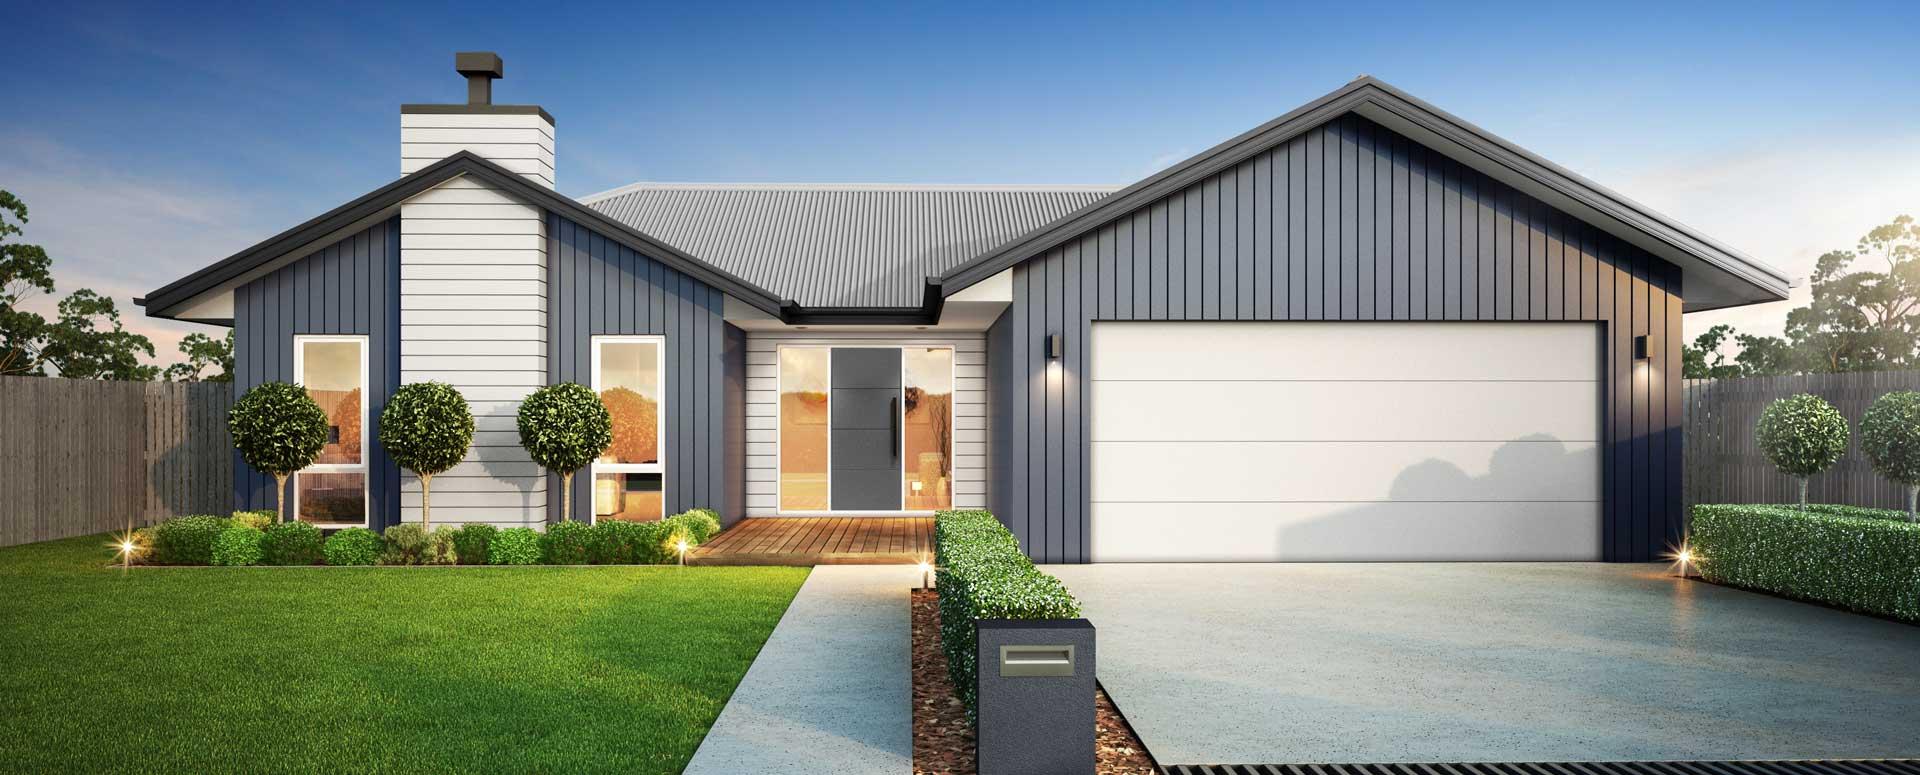 Millbrook Penny Homes Banner Image